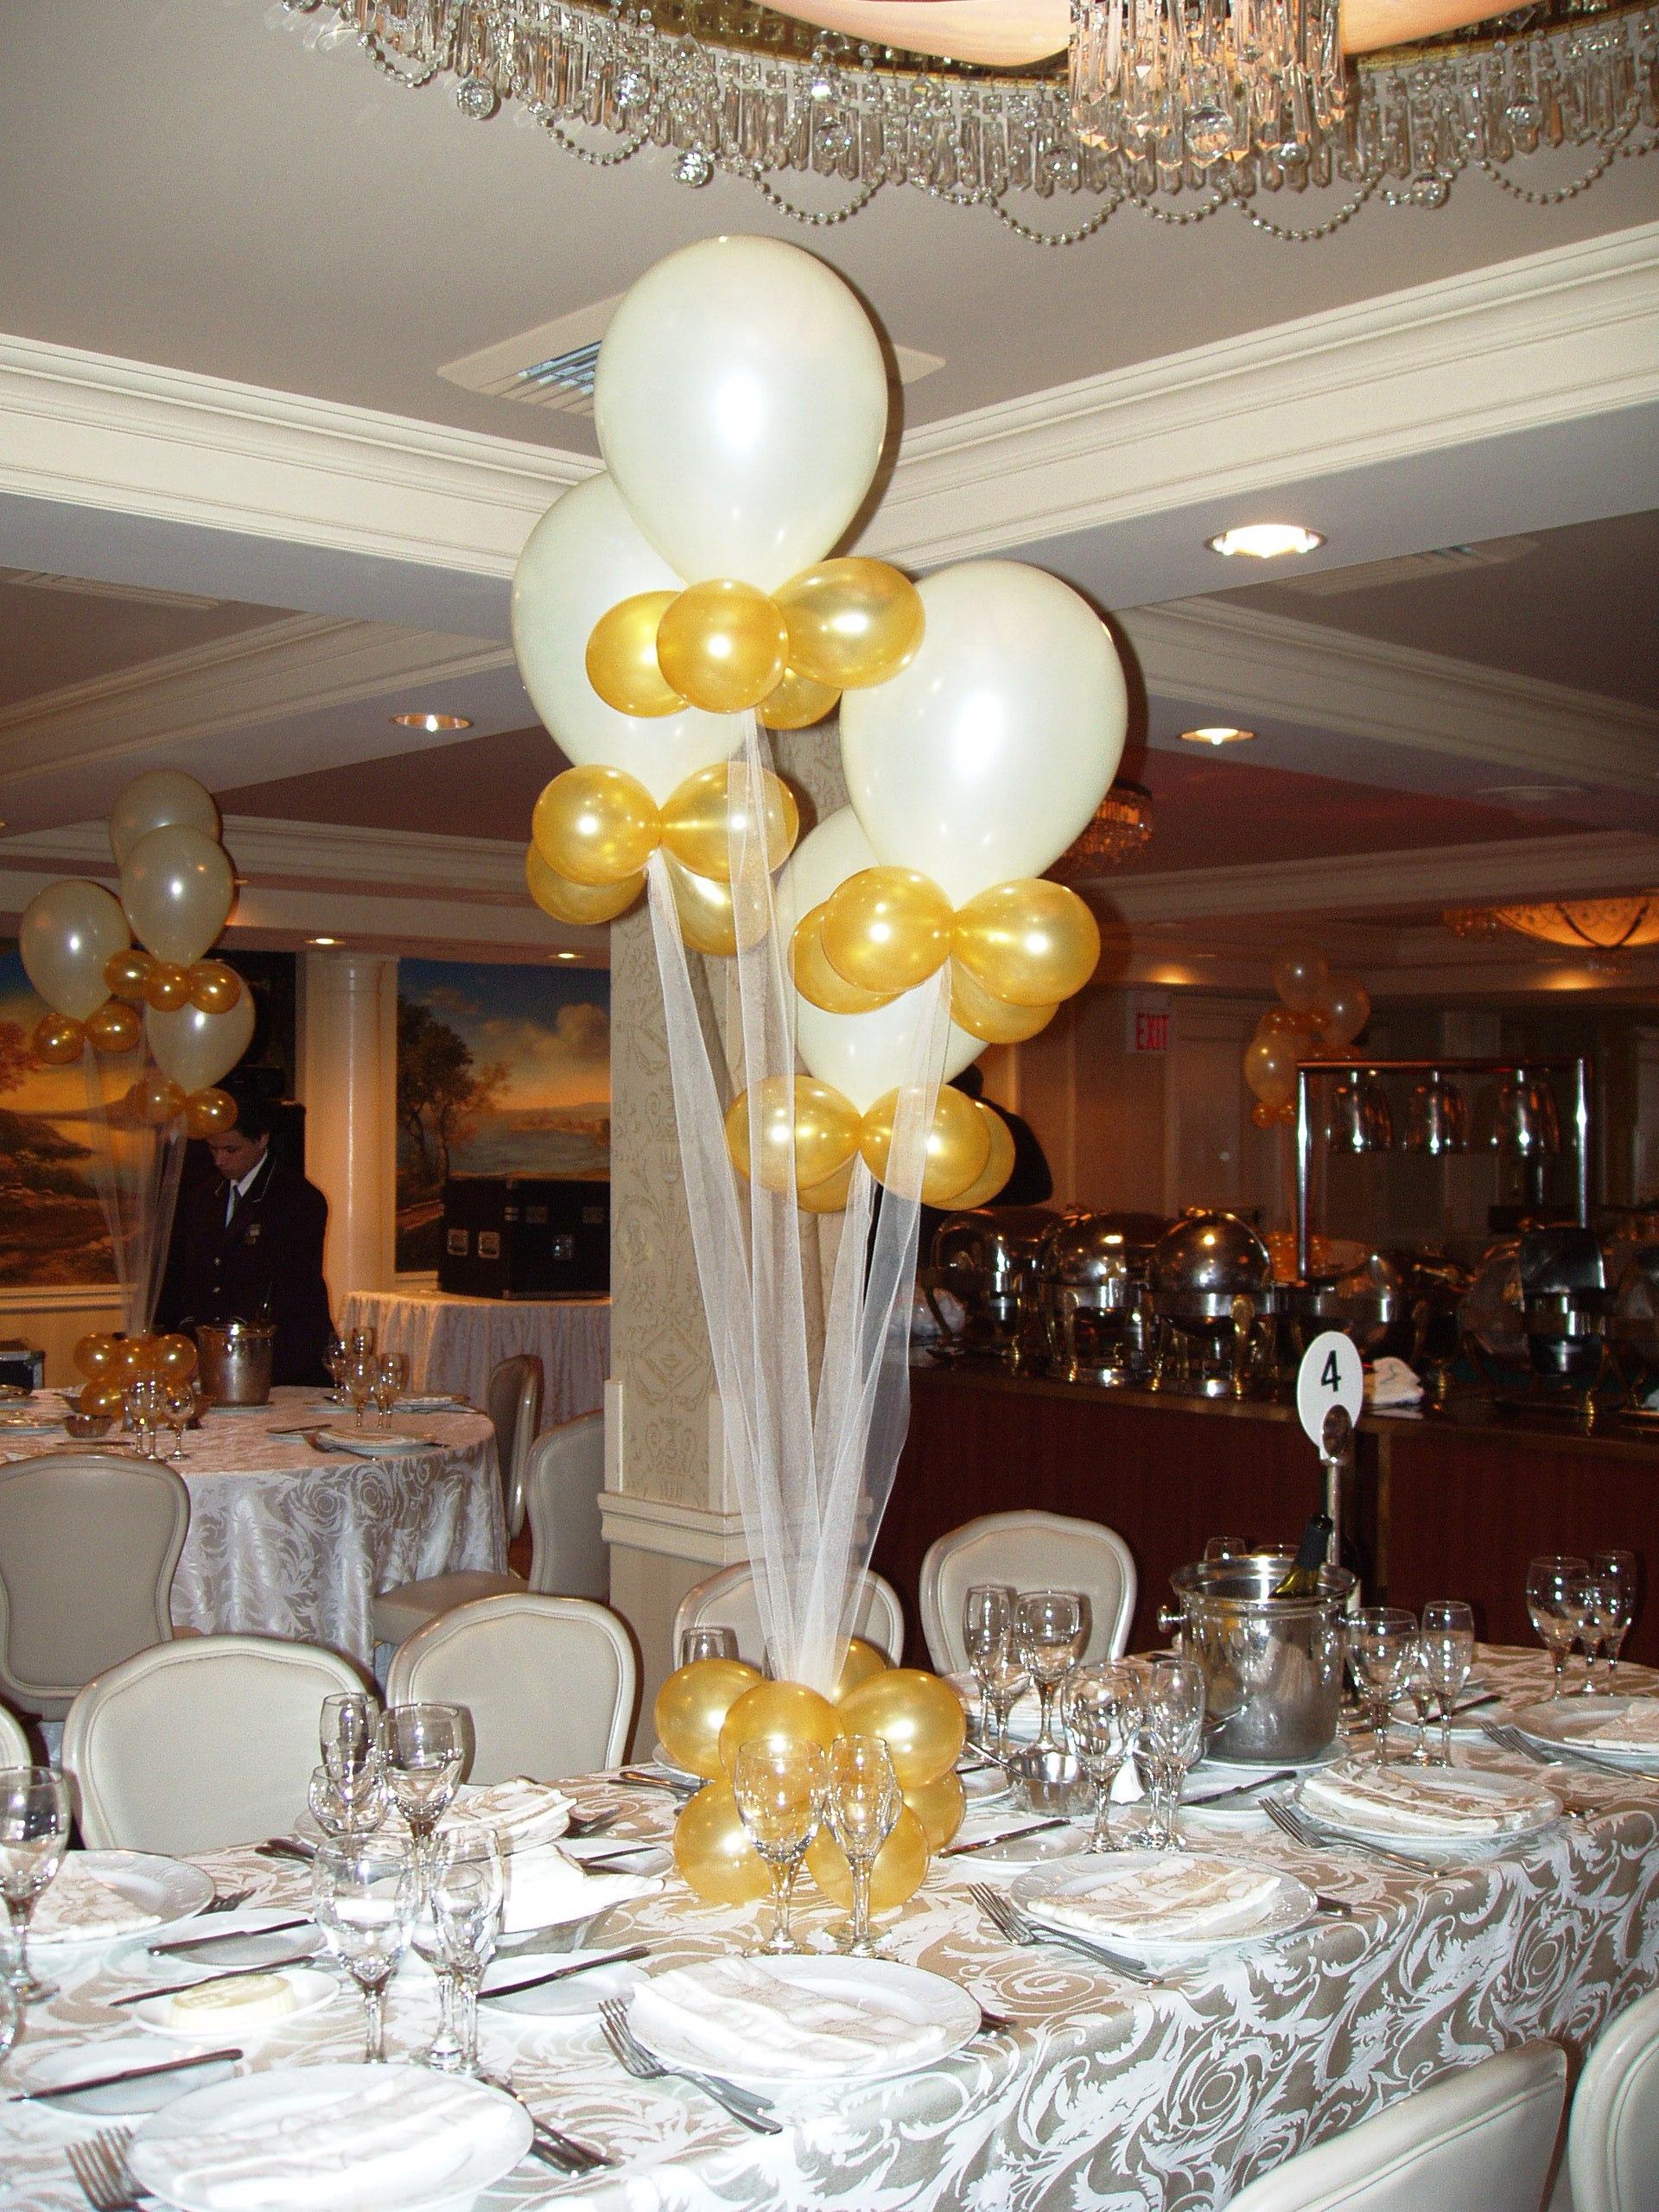 Elegant White & Gold Balloons